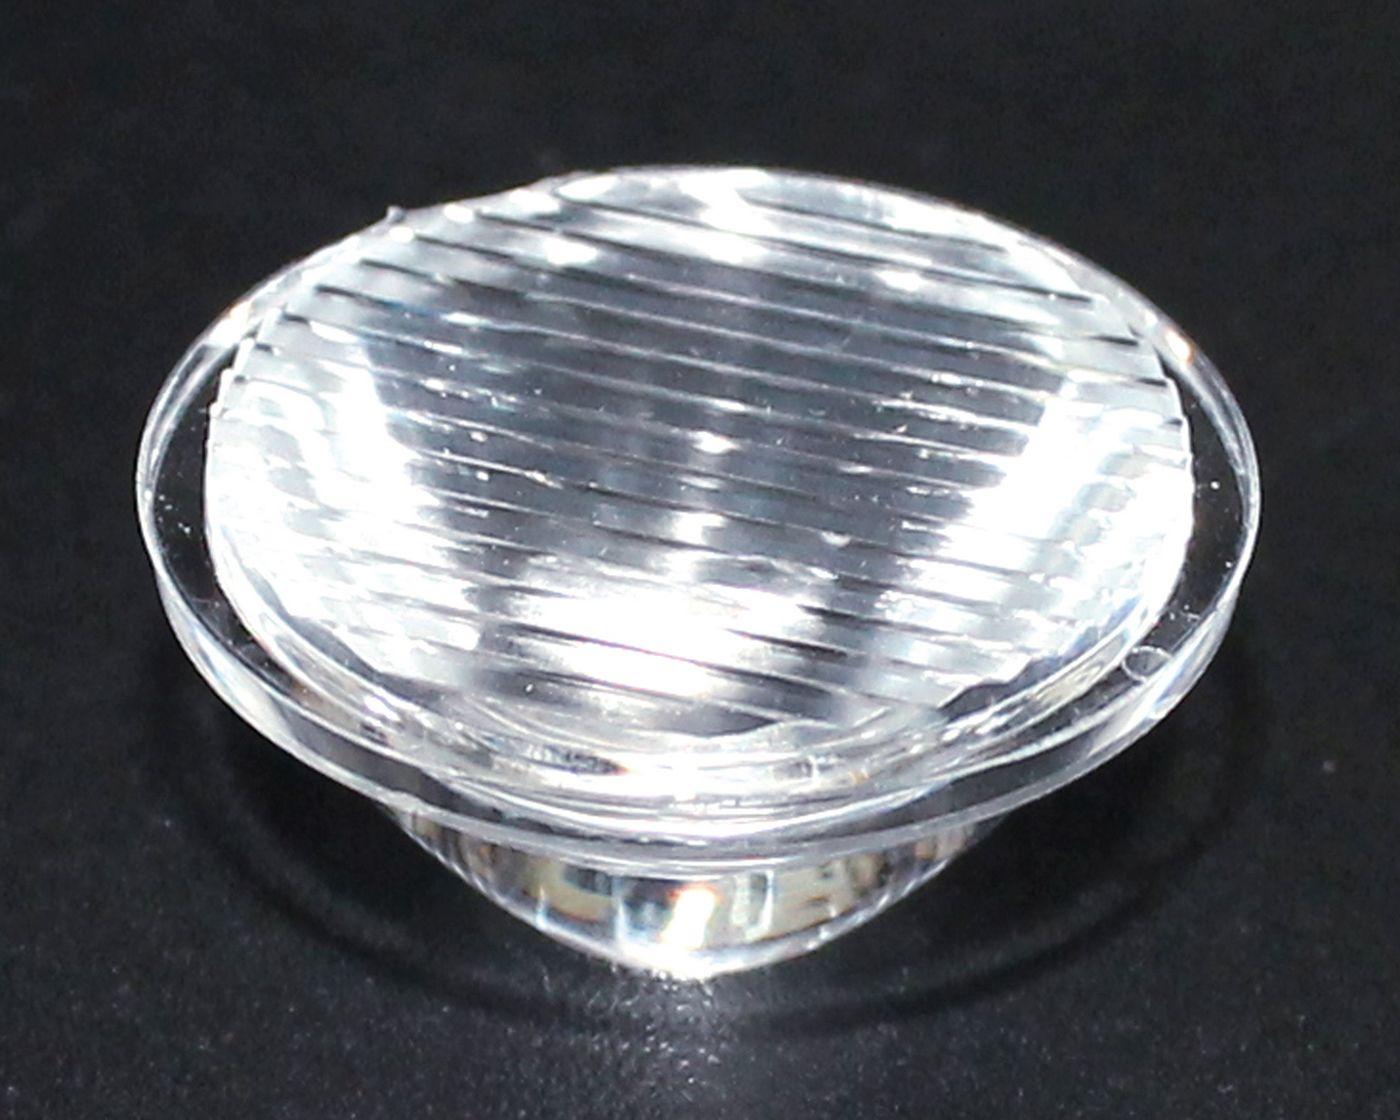 led透镜,大功率led光学透镜,透镜批发,XJ-22.5-30°沙面